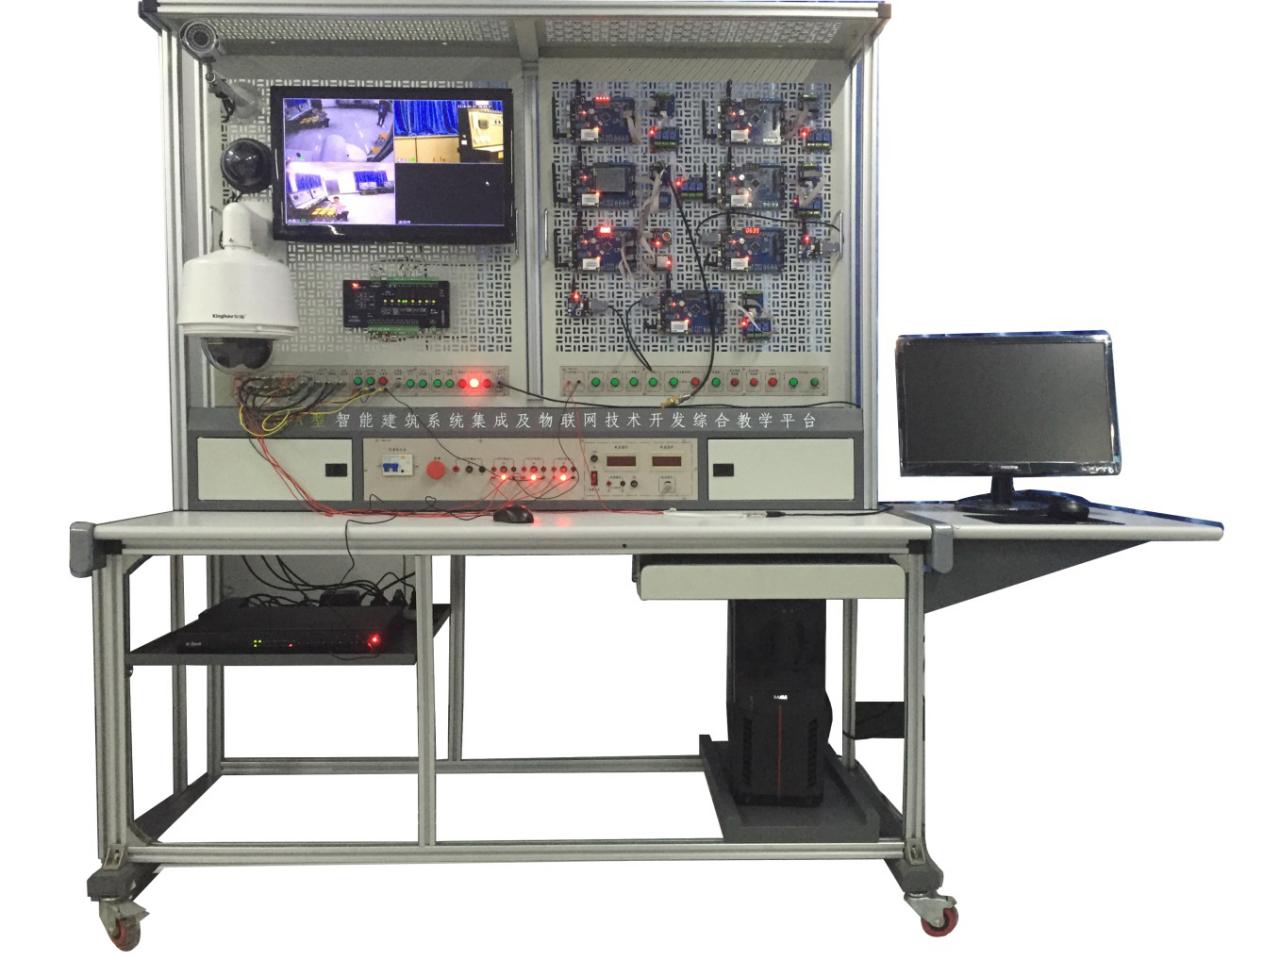 ddc手动自动切换控制电路接线图